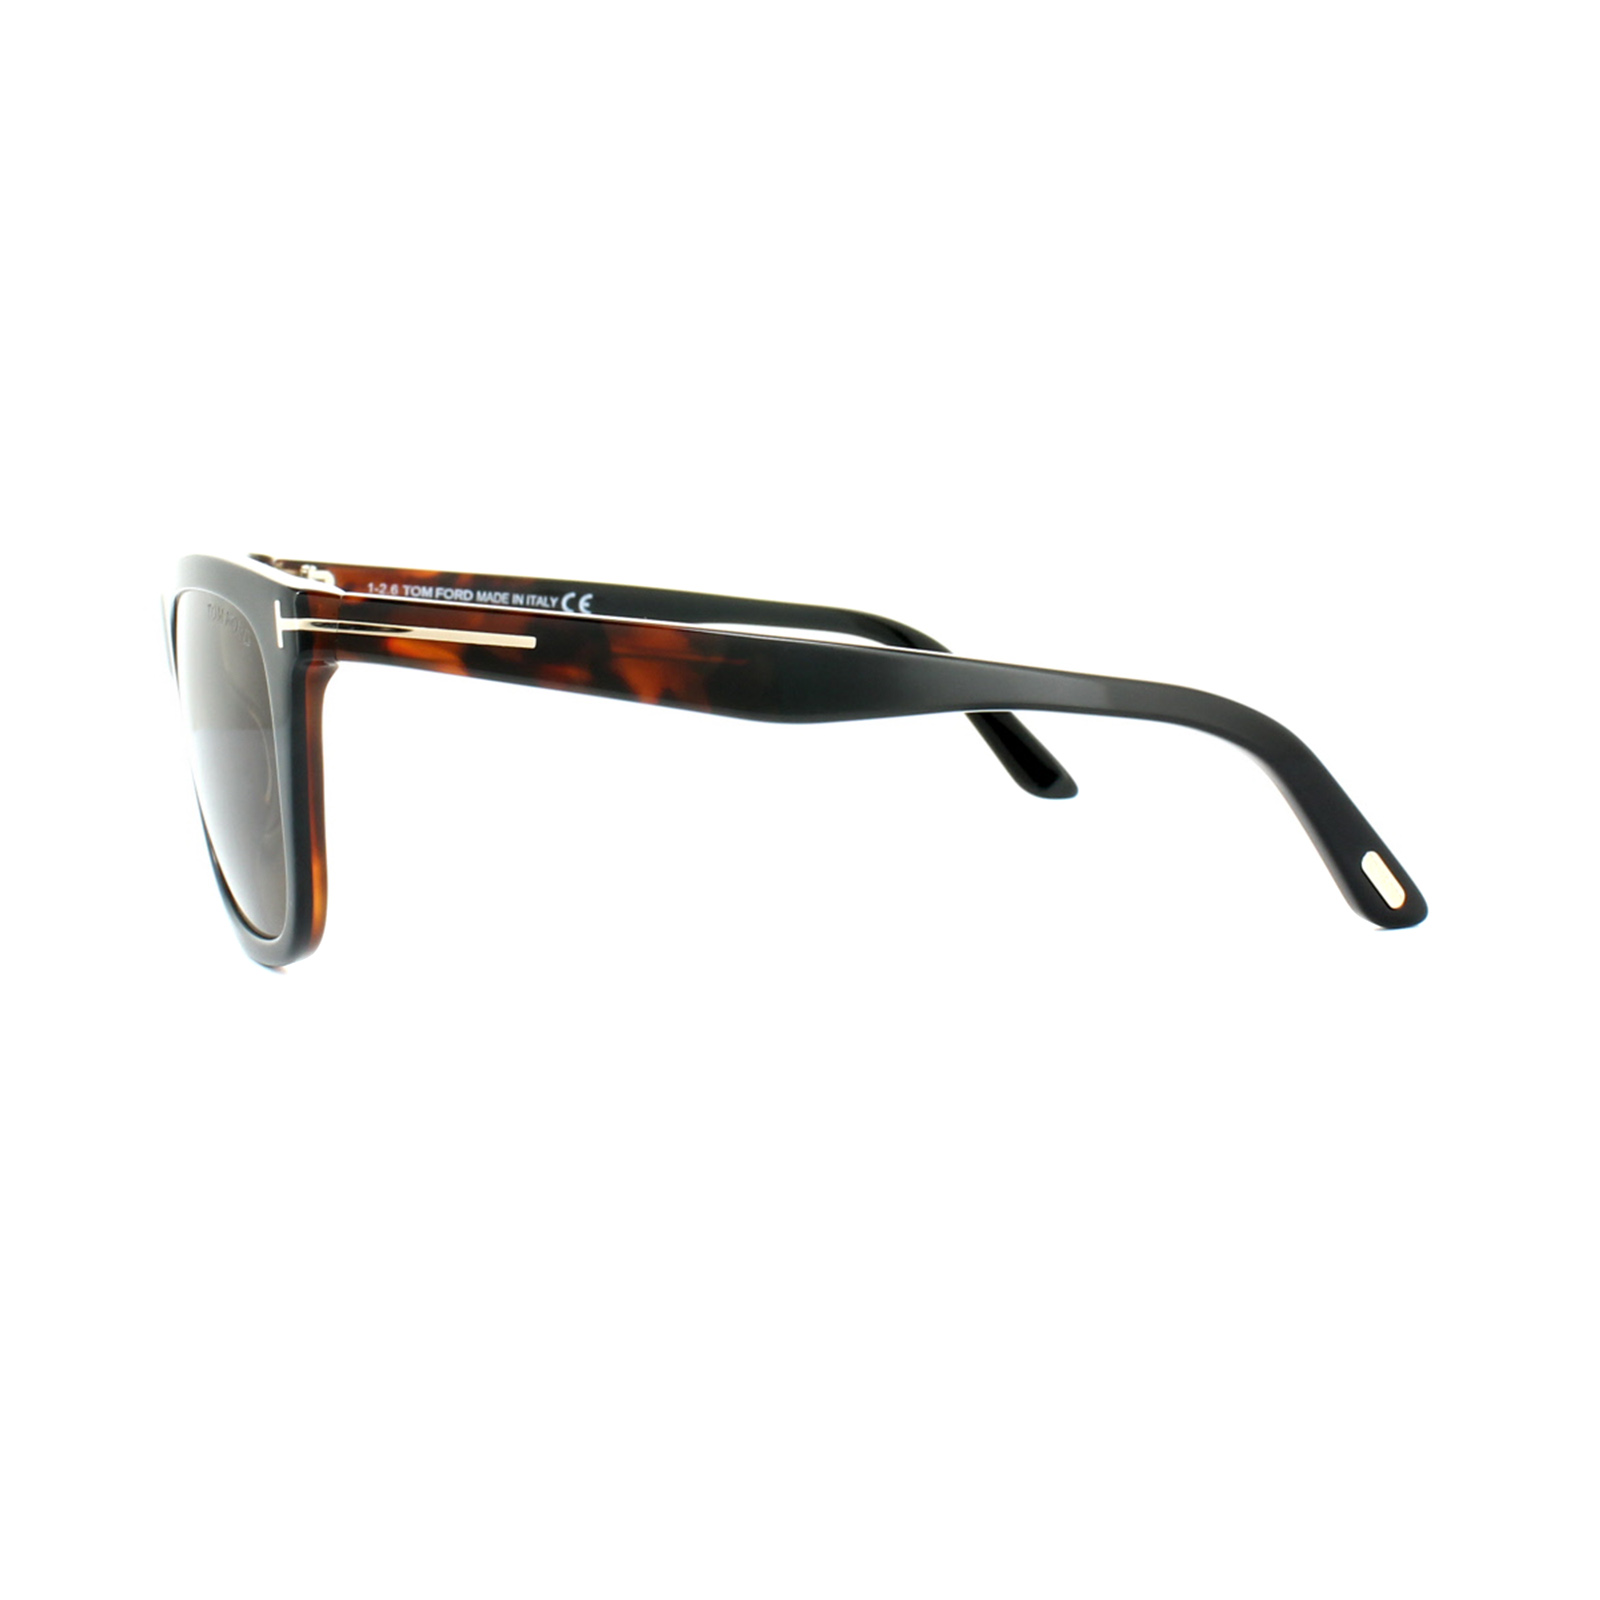 b5413ec0e9 Sentinel Tom Ford Sunglasses 0500 Andrew 05J Black Havana Roviex Brown